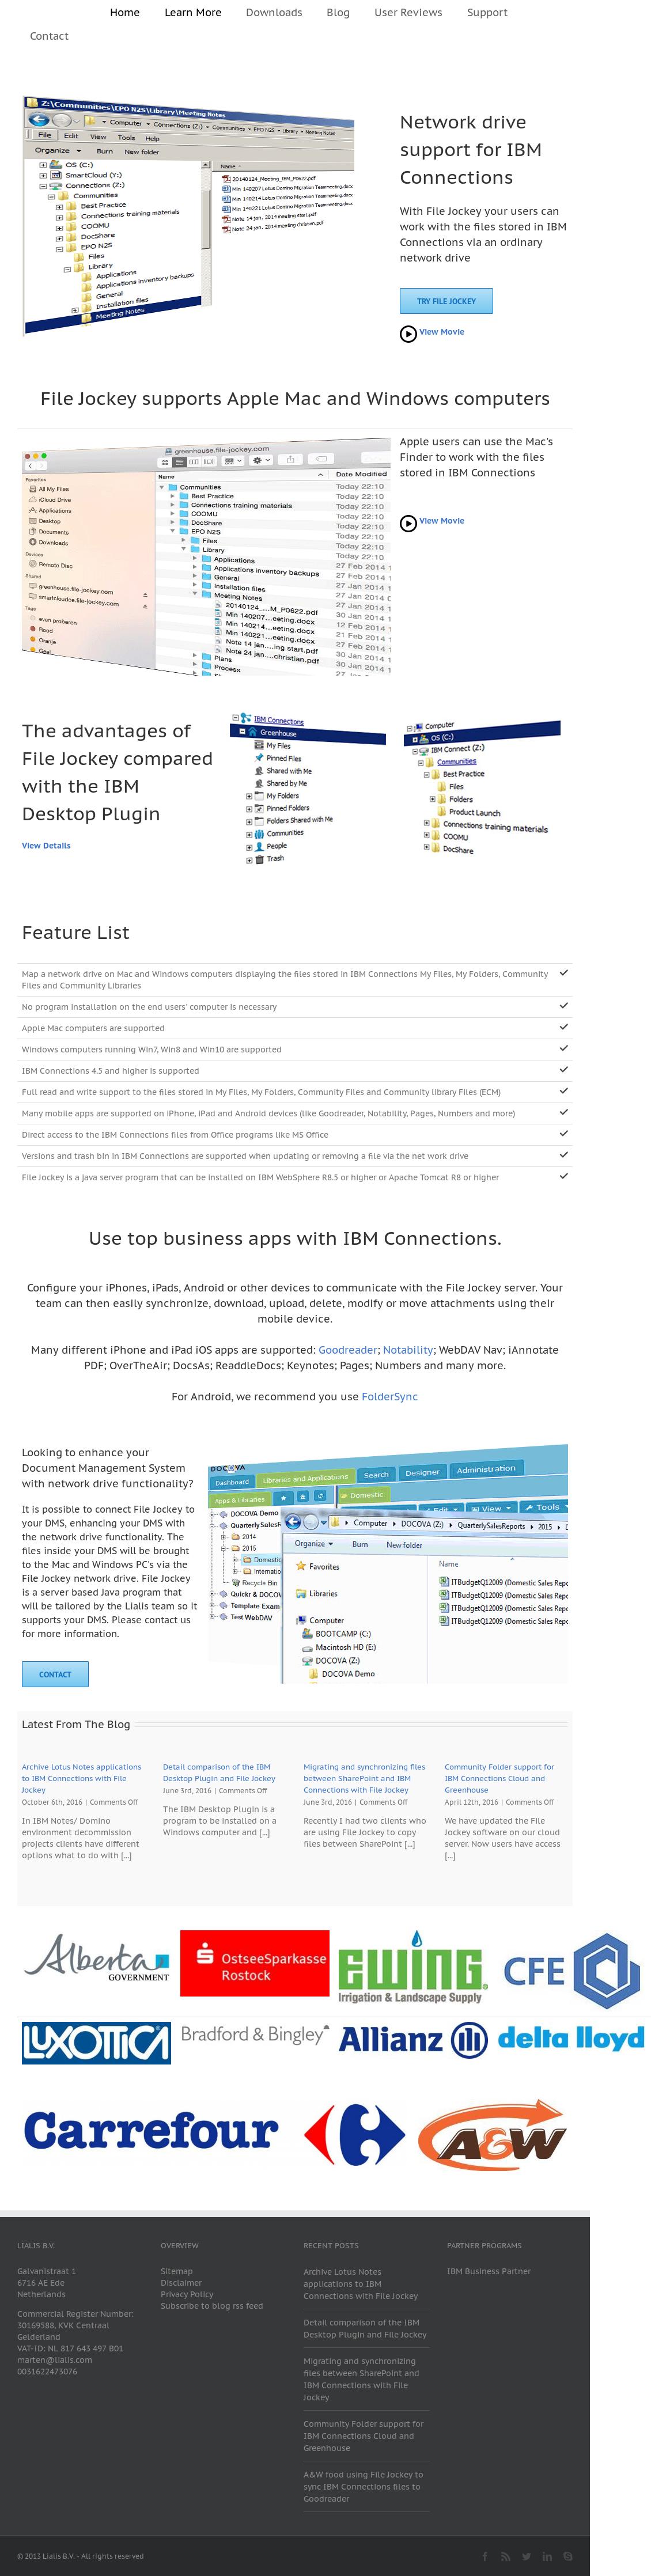 File Jockey Competitors, Revenue and Employees - Owler Company Profile